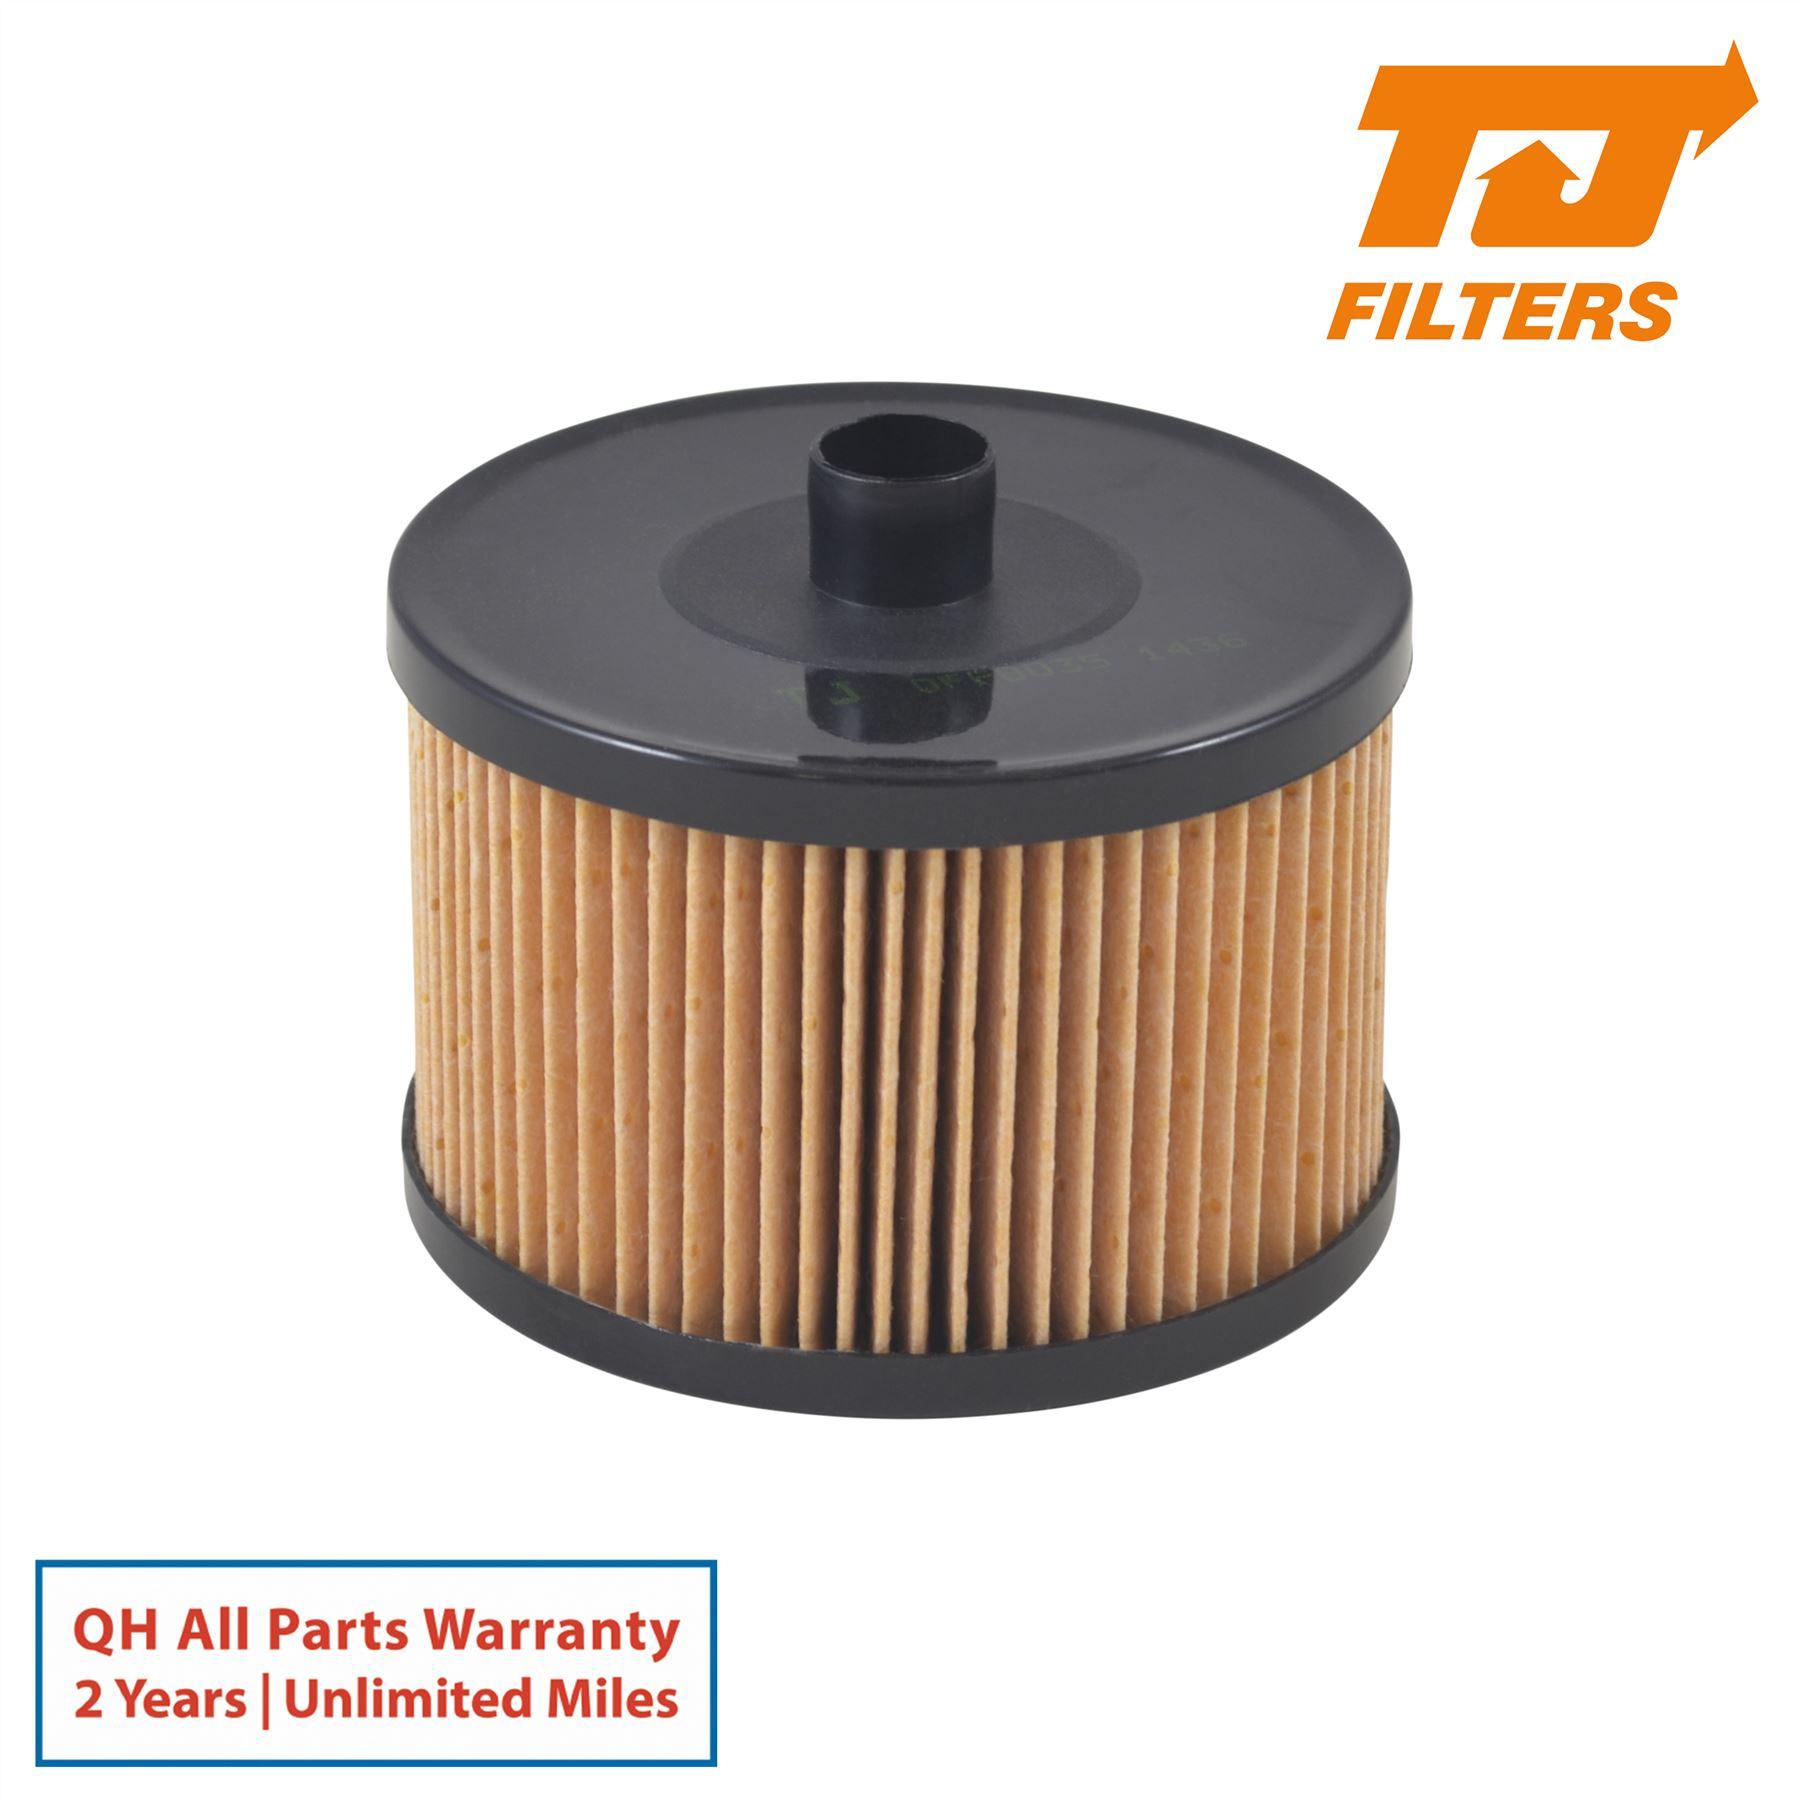 Peugeot 3008 2009-2016 Purflux Fuel Filter Engine Service Replacement Part